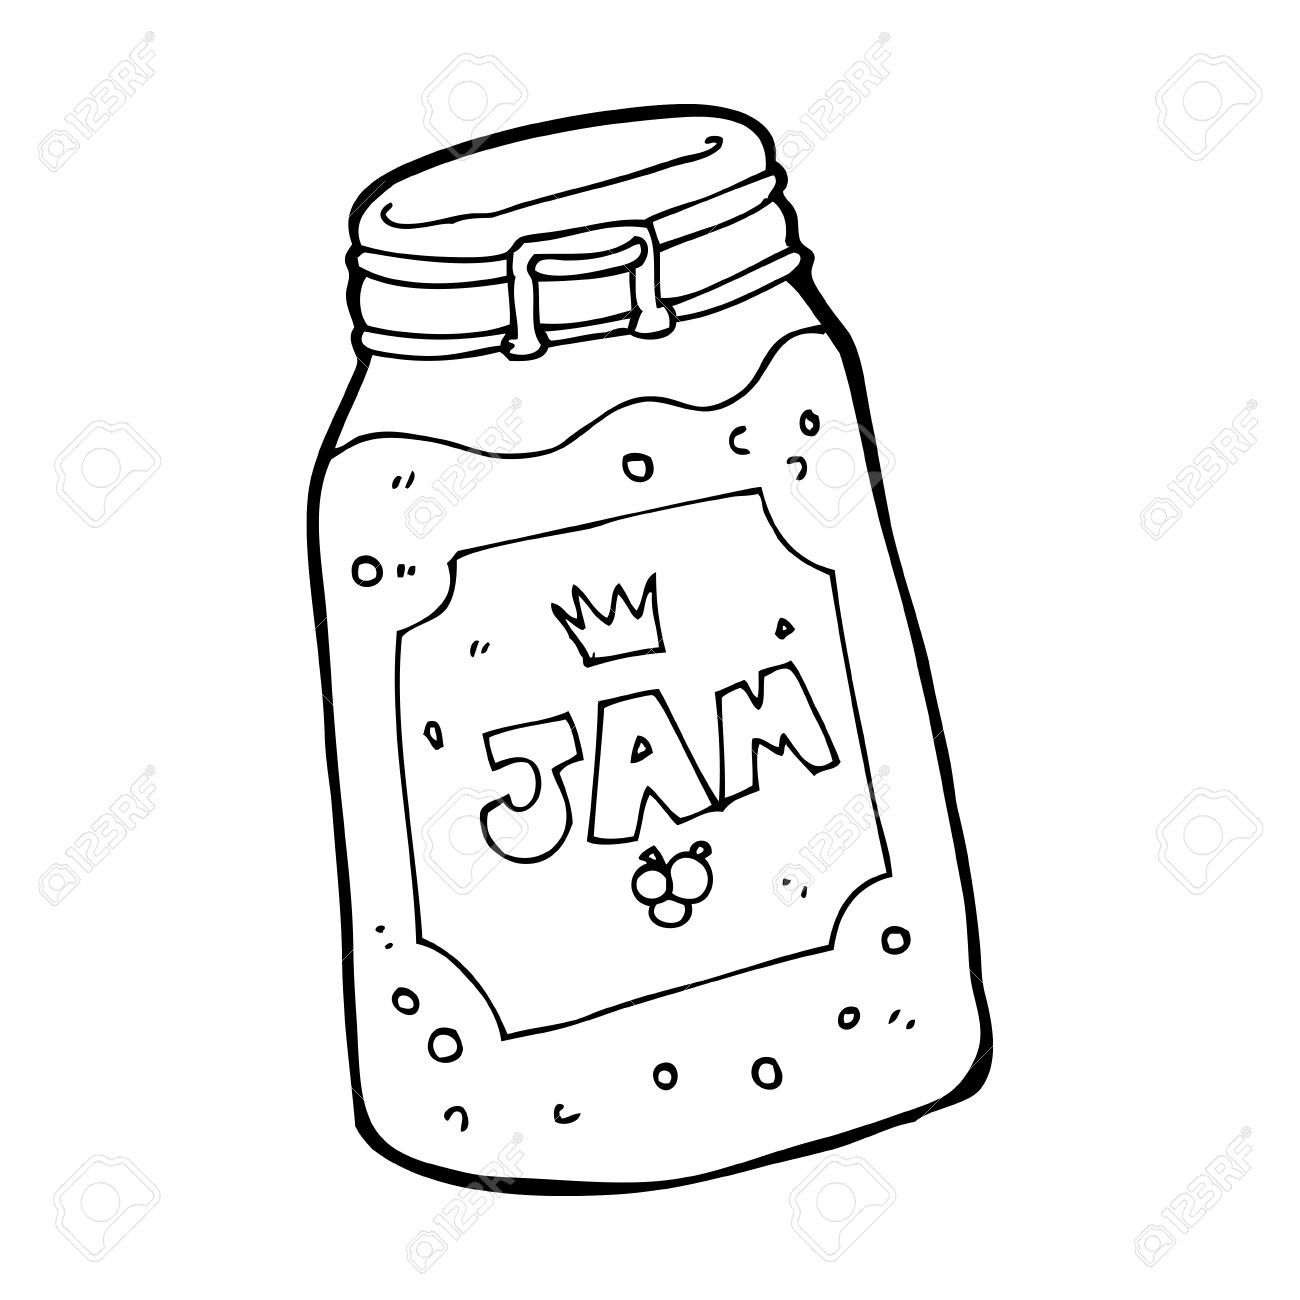 1300x1300 Drawn Jam Jam Jar